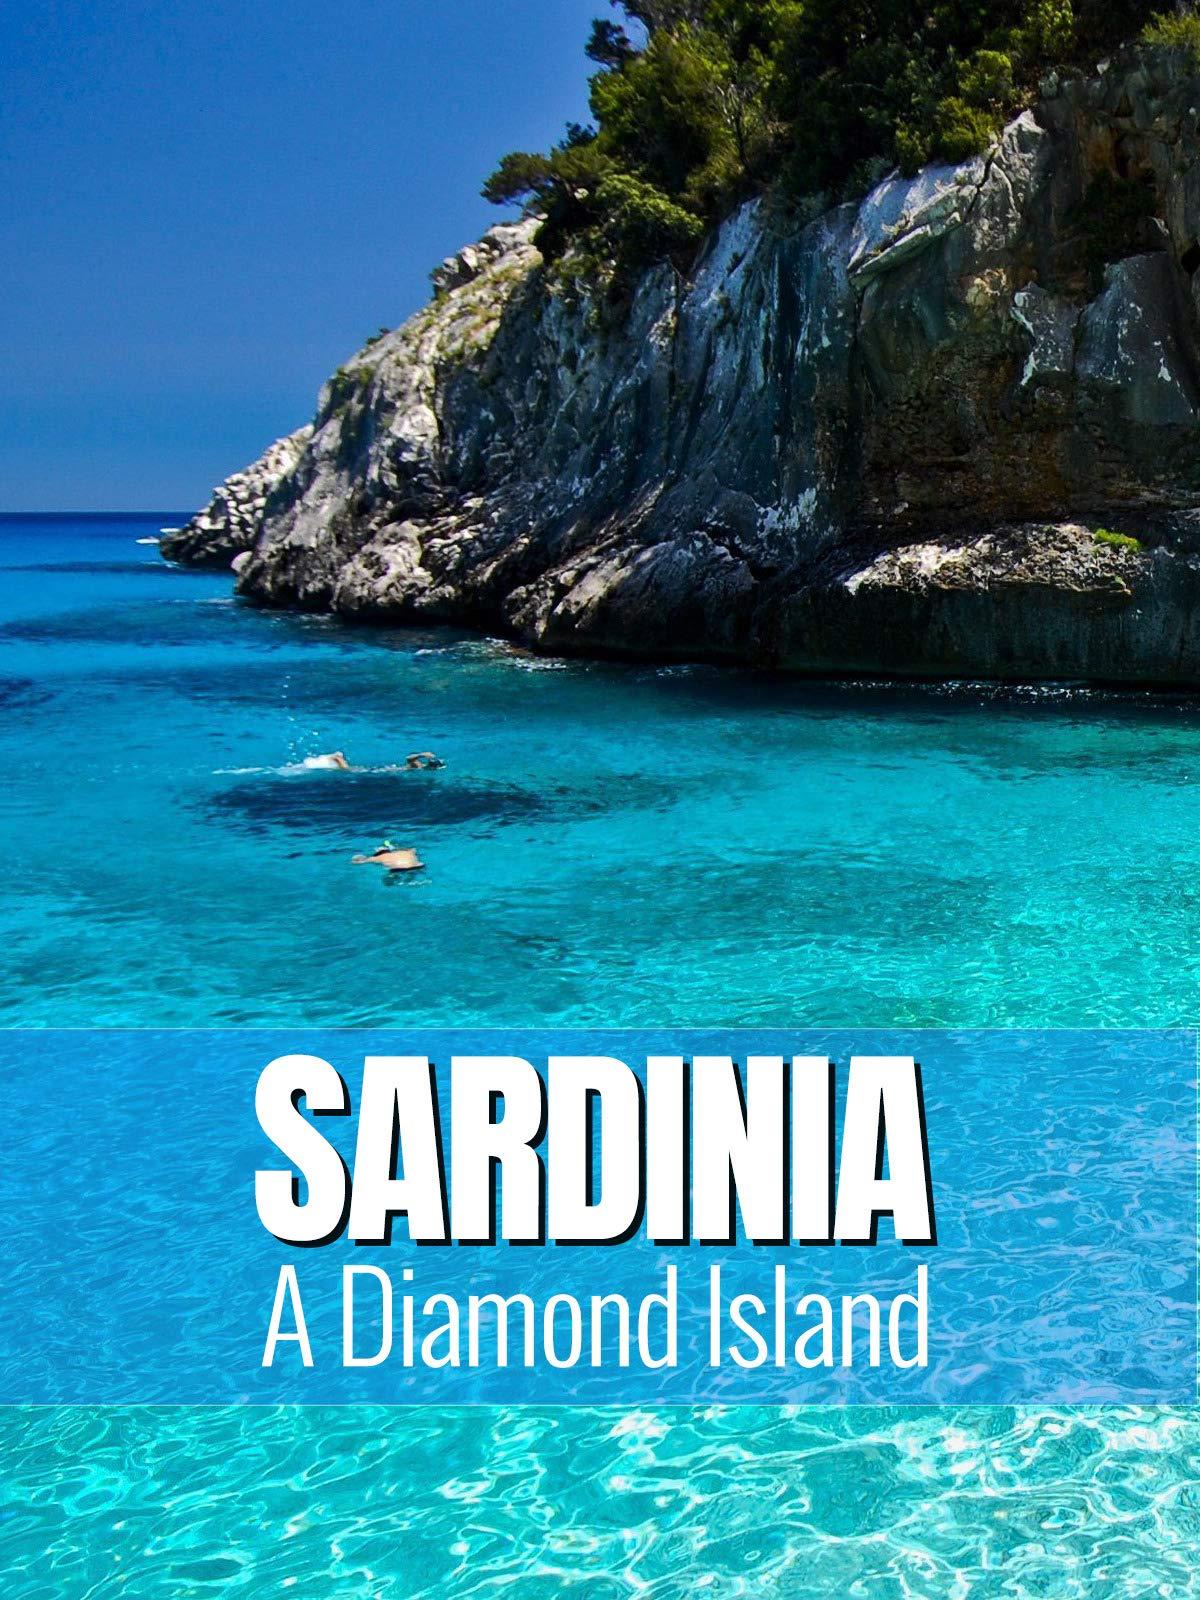 Sardinia - A Diamond Island on Amazon Prime Video UK